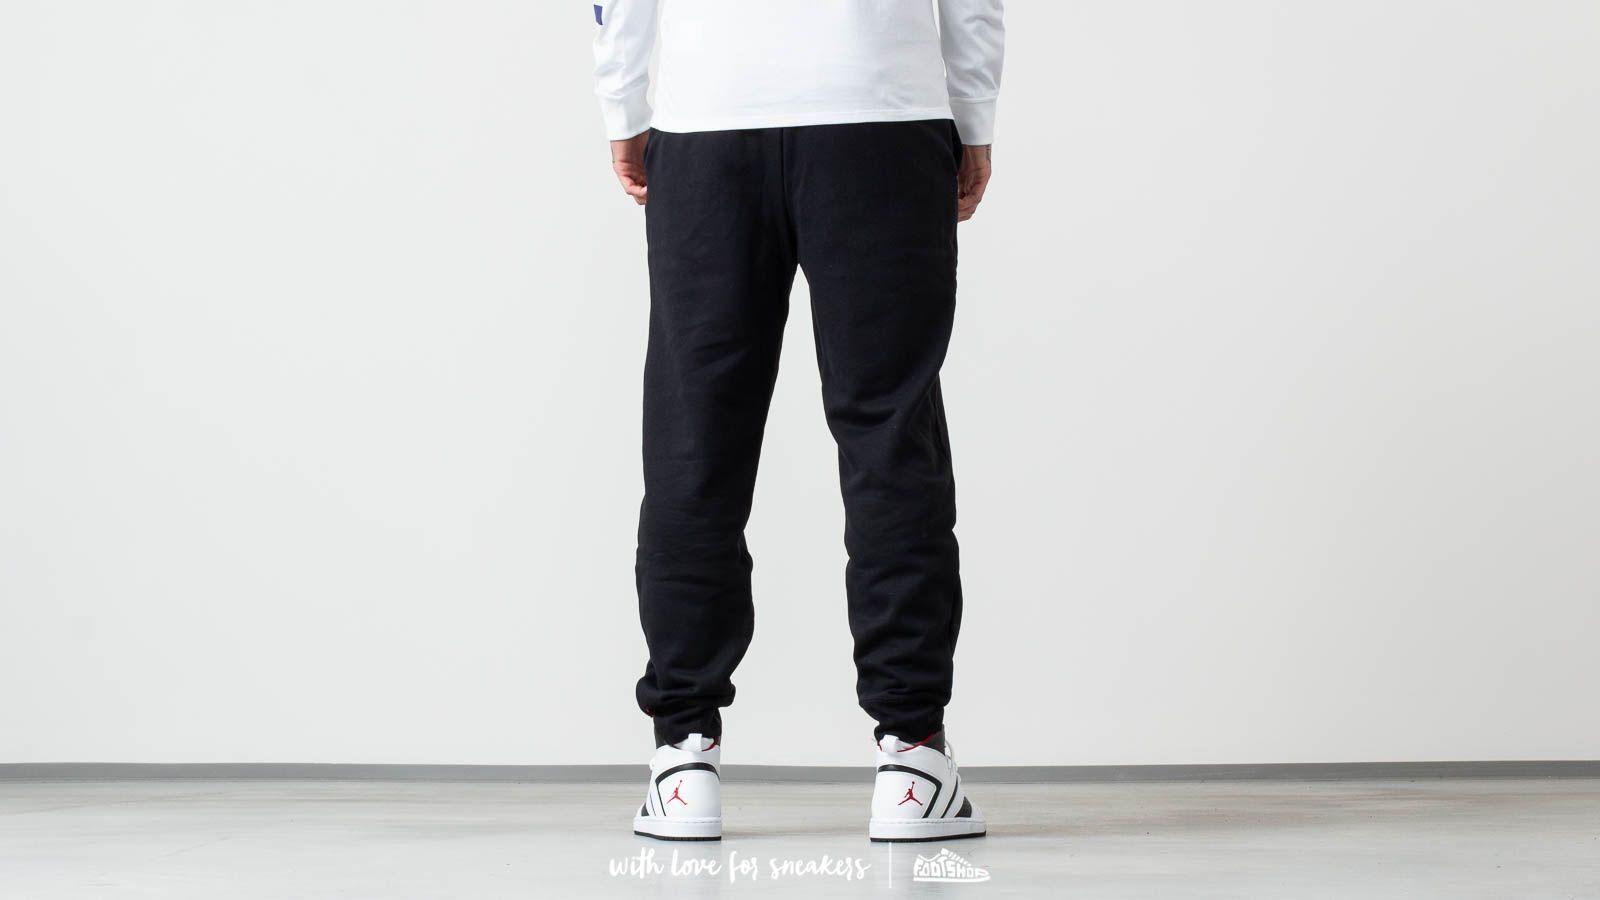 24013d4b0fb0e Jordan Sportswear AJ 11 Pants Black a prezzo eccezionale 46 € acquistate su  Footshop.it